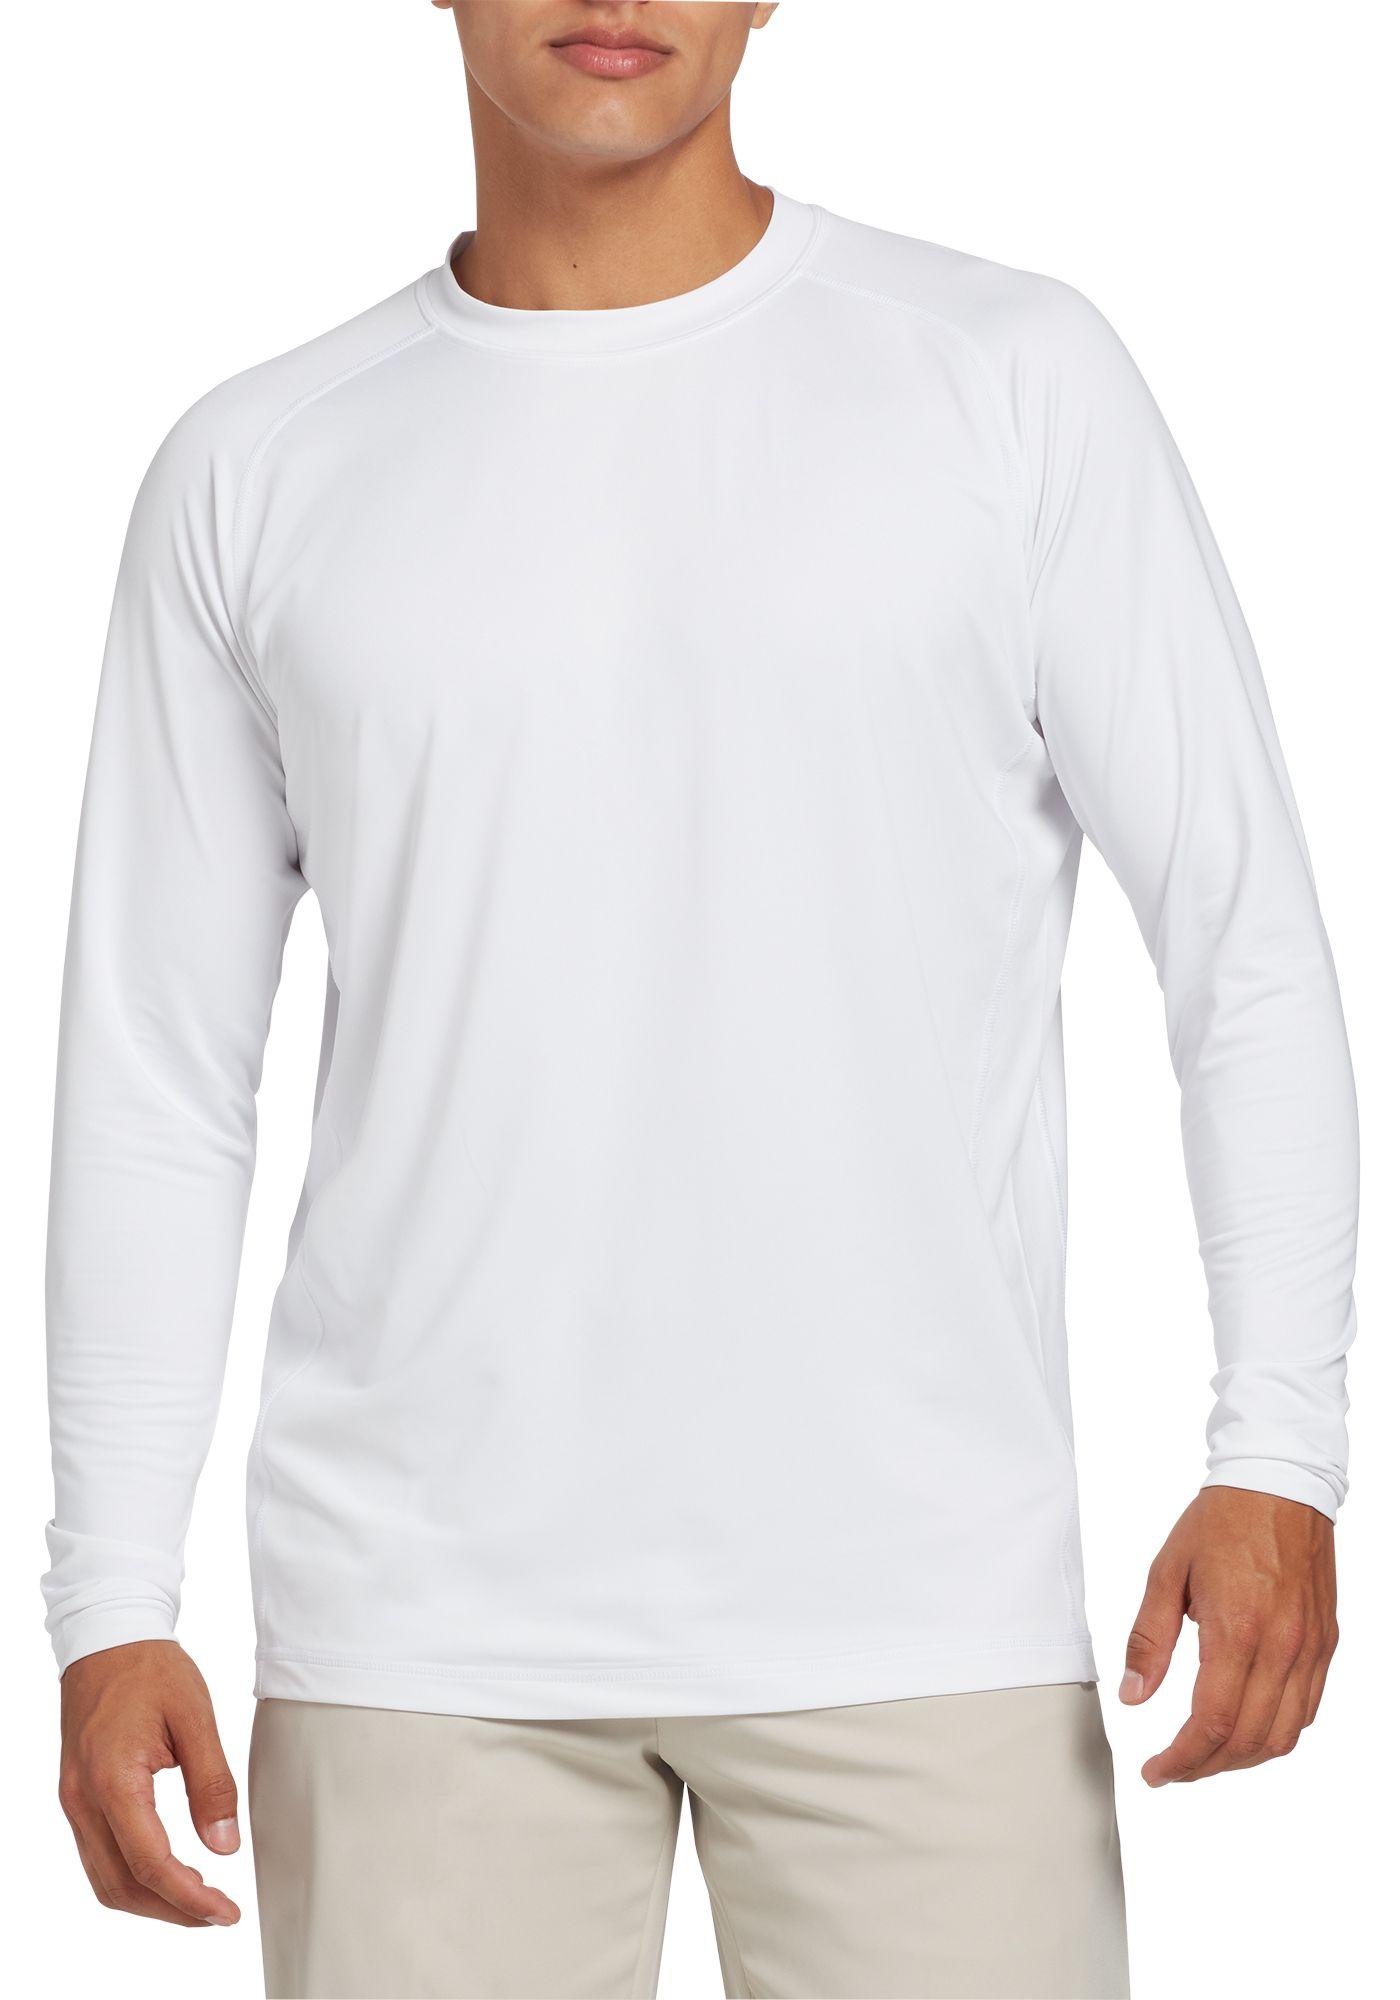 Walter Hagen Men's Cold Weather Baselayer Golf Shirt